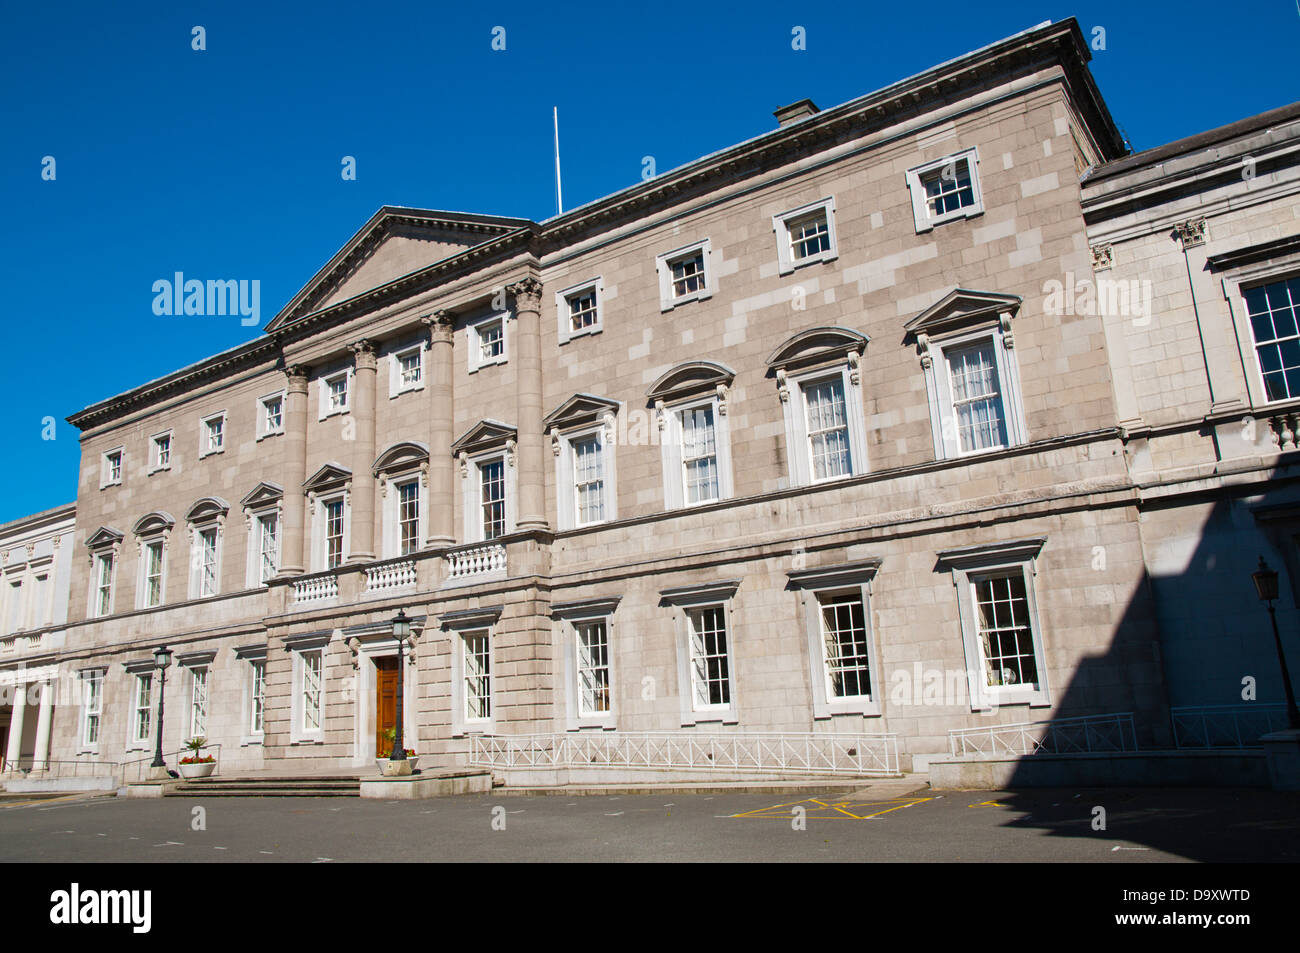 Leinster House (1745) Georgian building housing national parliament Kildare Street central Dublin Ireland Europe - Stock Image